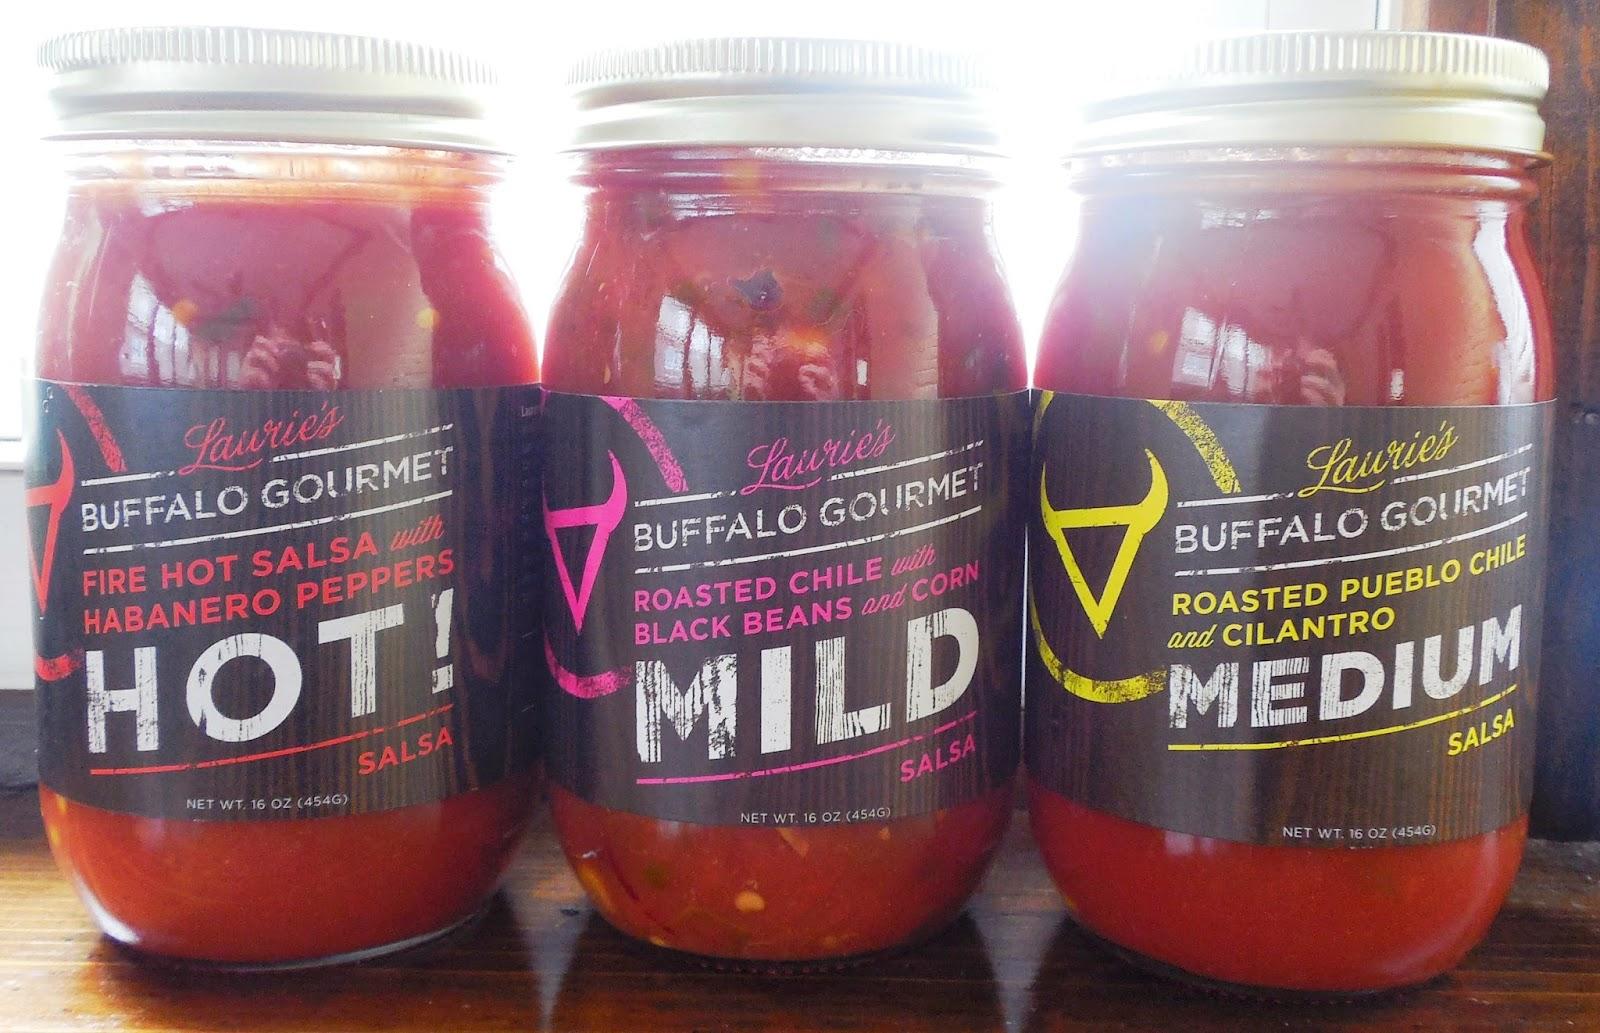 Buffalo Gourmet Salsa